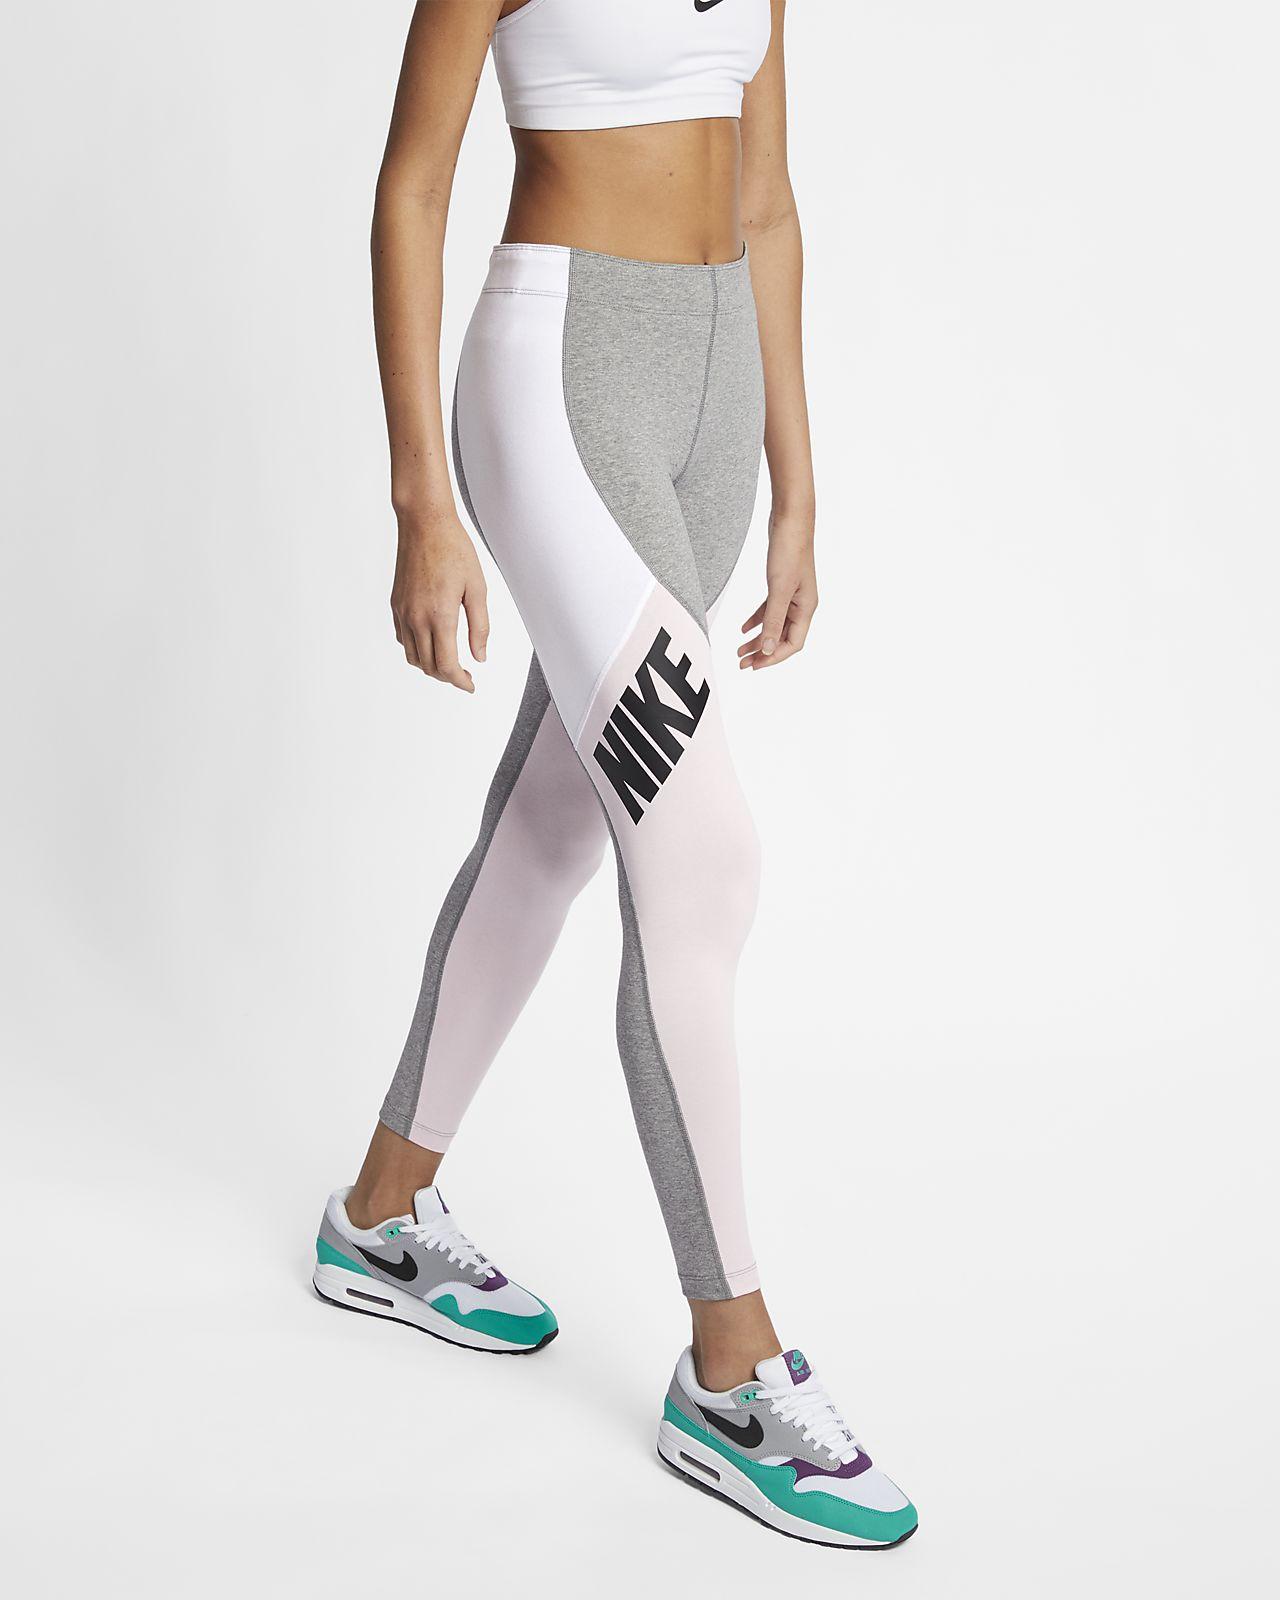 8dad50fd9b Nike Sportswear Leg-A-See Women's Leggings. Nike.com SI